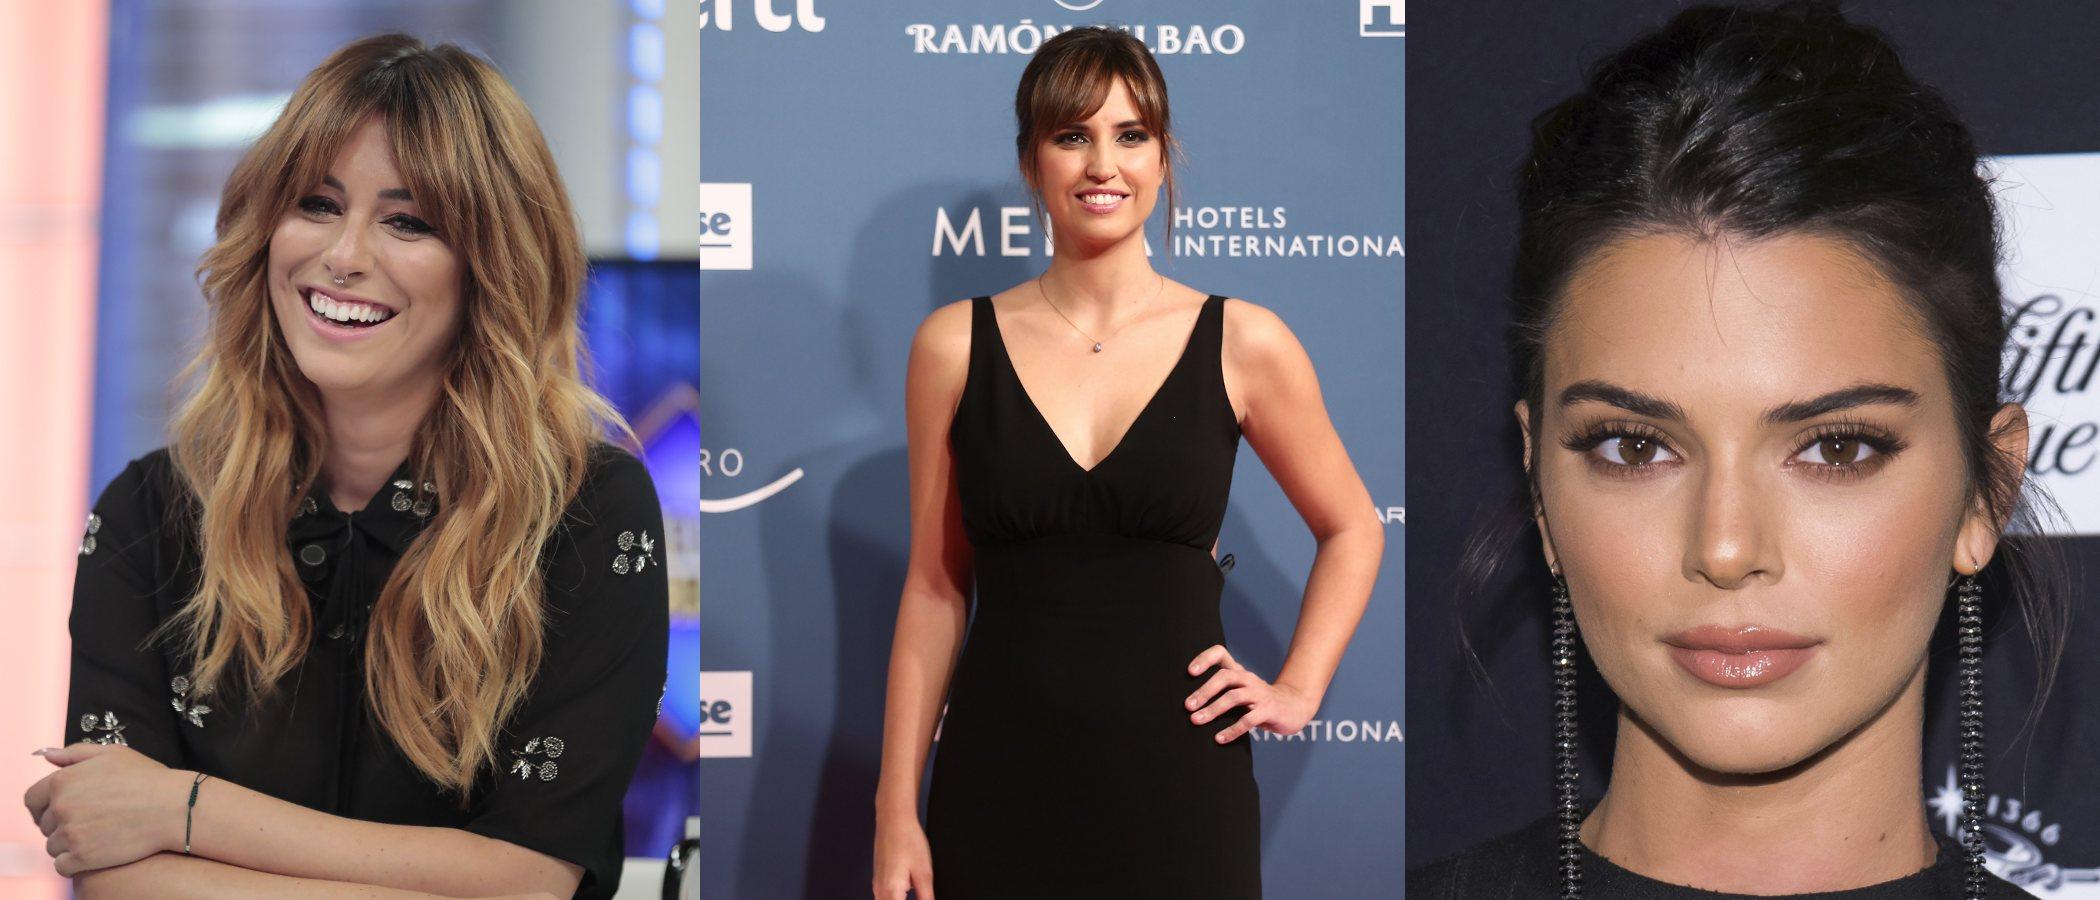 Blanca Suárez, Sandra Sabatés y Kendall Jenner entre los mejores beauty looks del año